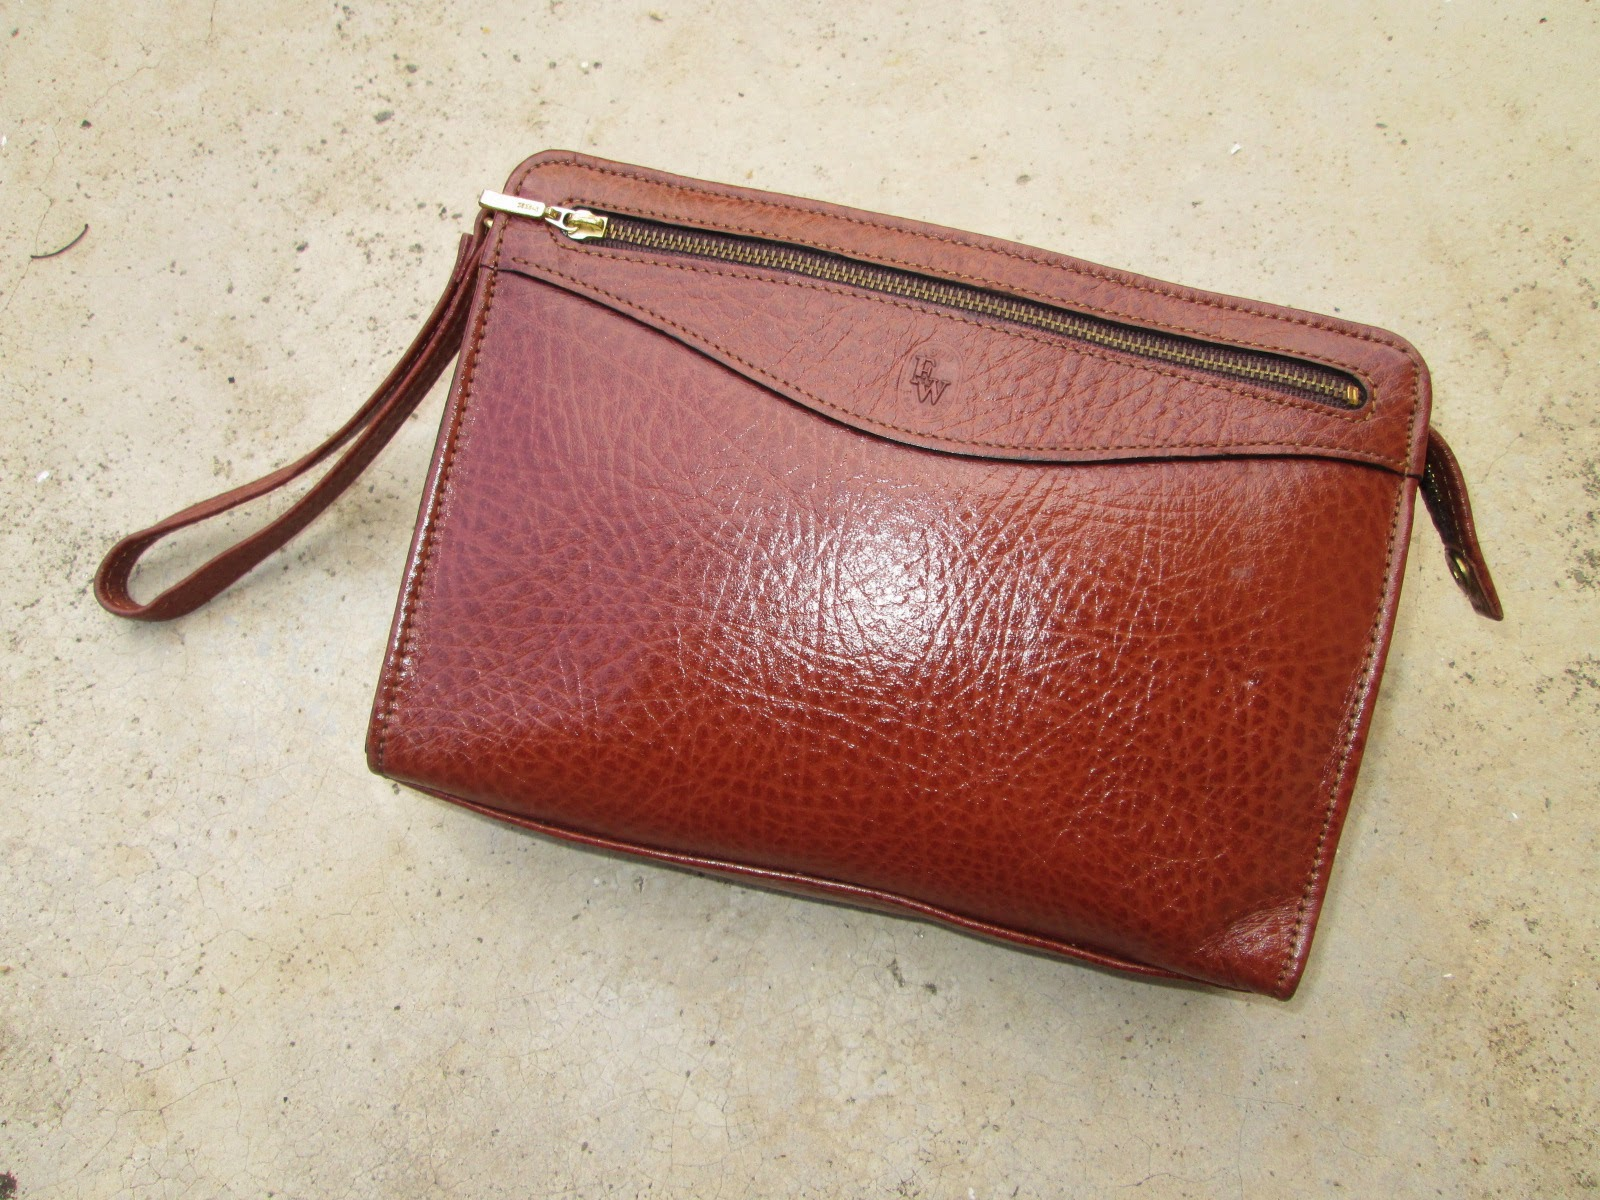 D0rayakeebag East Wood Leather Vtg Clutch Bag Sold